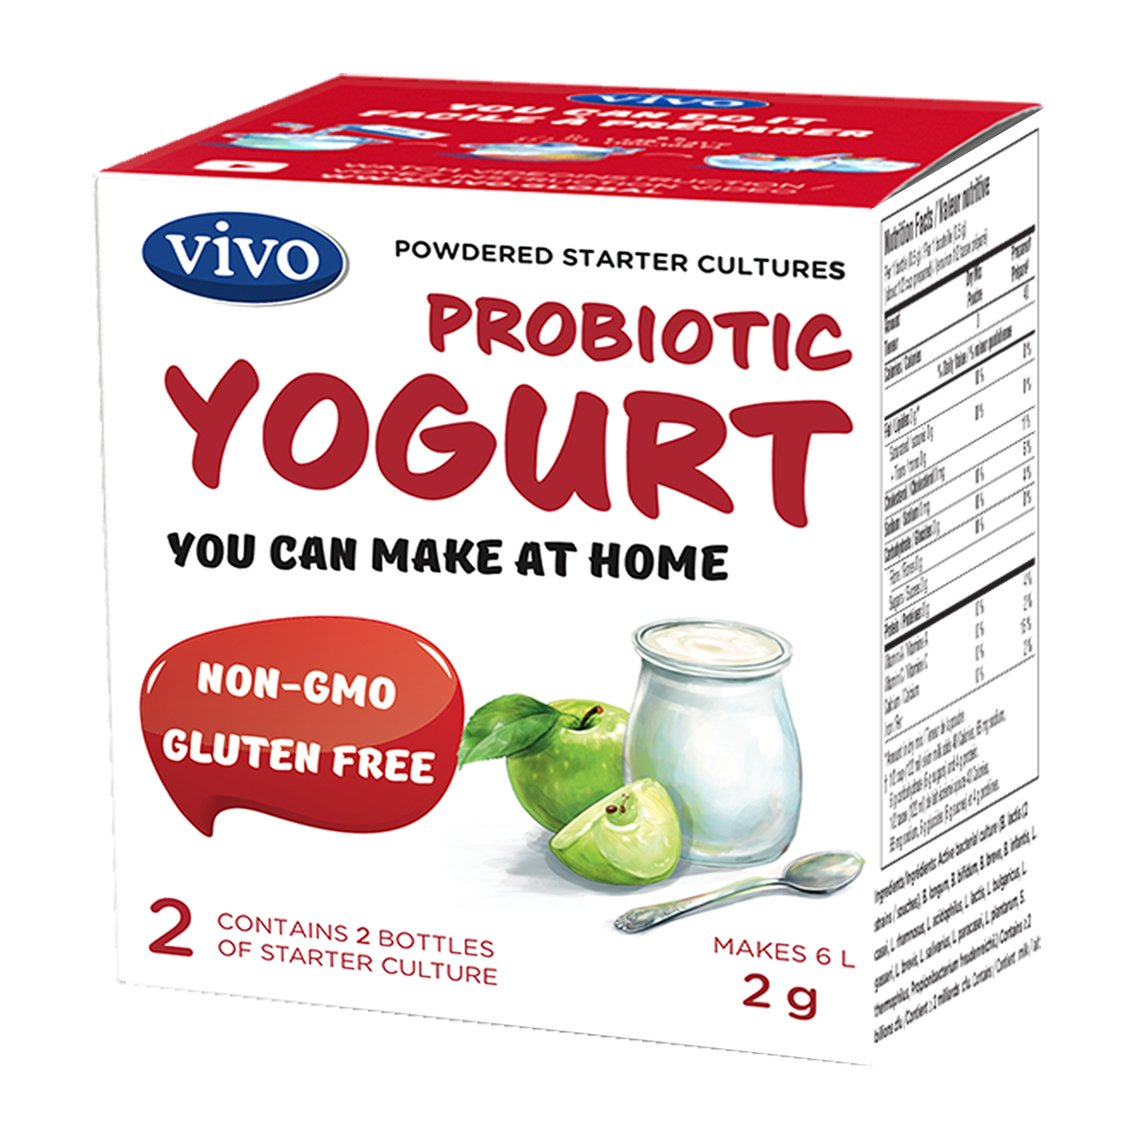 VIVO Probiotic Yogurt Starter Cultures/Natural (5 Boxes. 10 Bottles) Makes up to 30 litres VIVO-Active